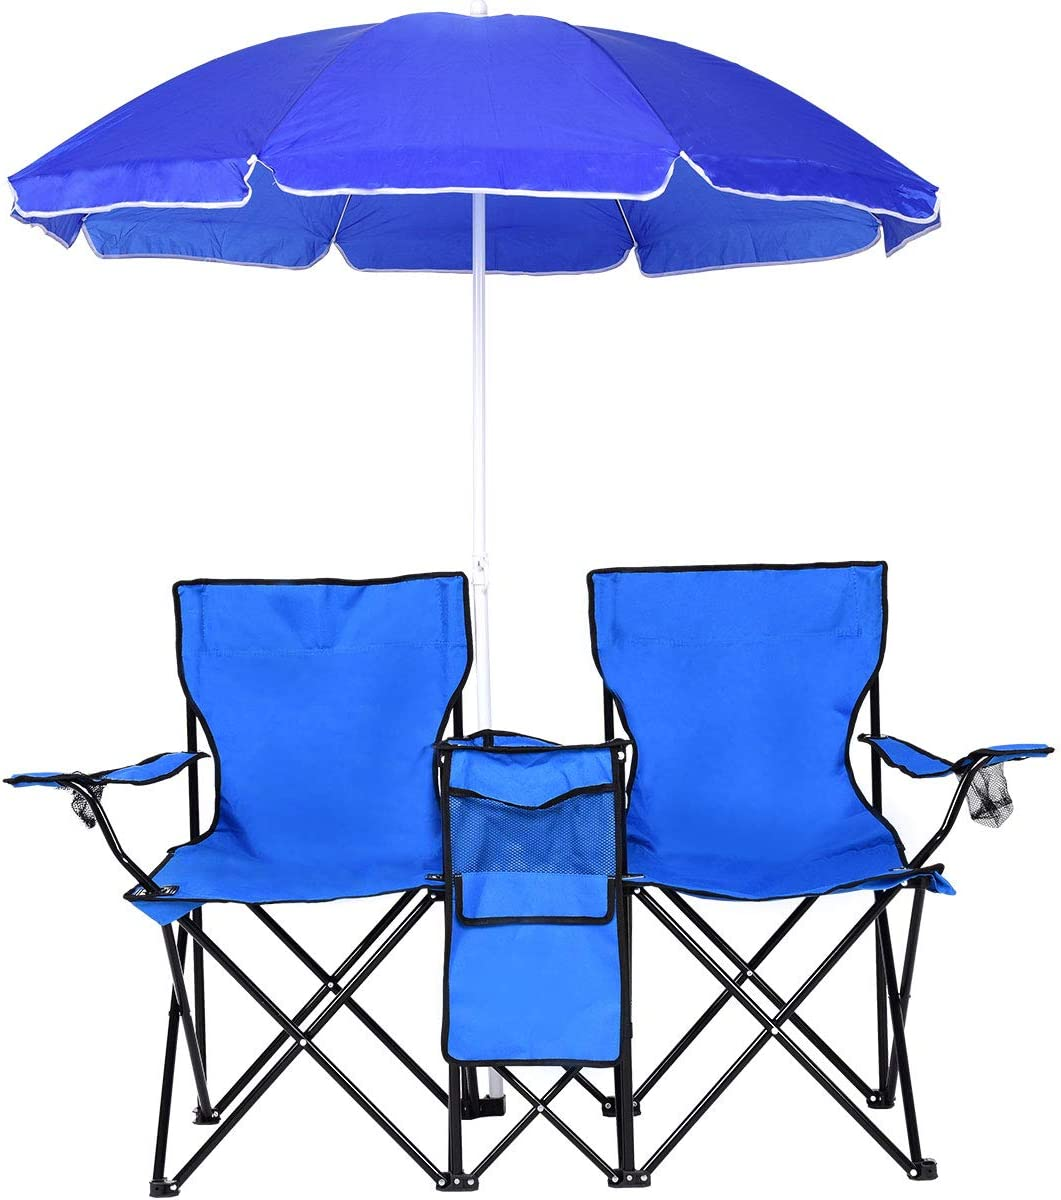 Portable Foldable Outdoor Picnic Beach Camping Double Chair w// Umbrella /& Cooler